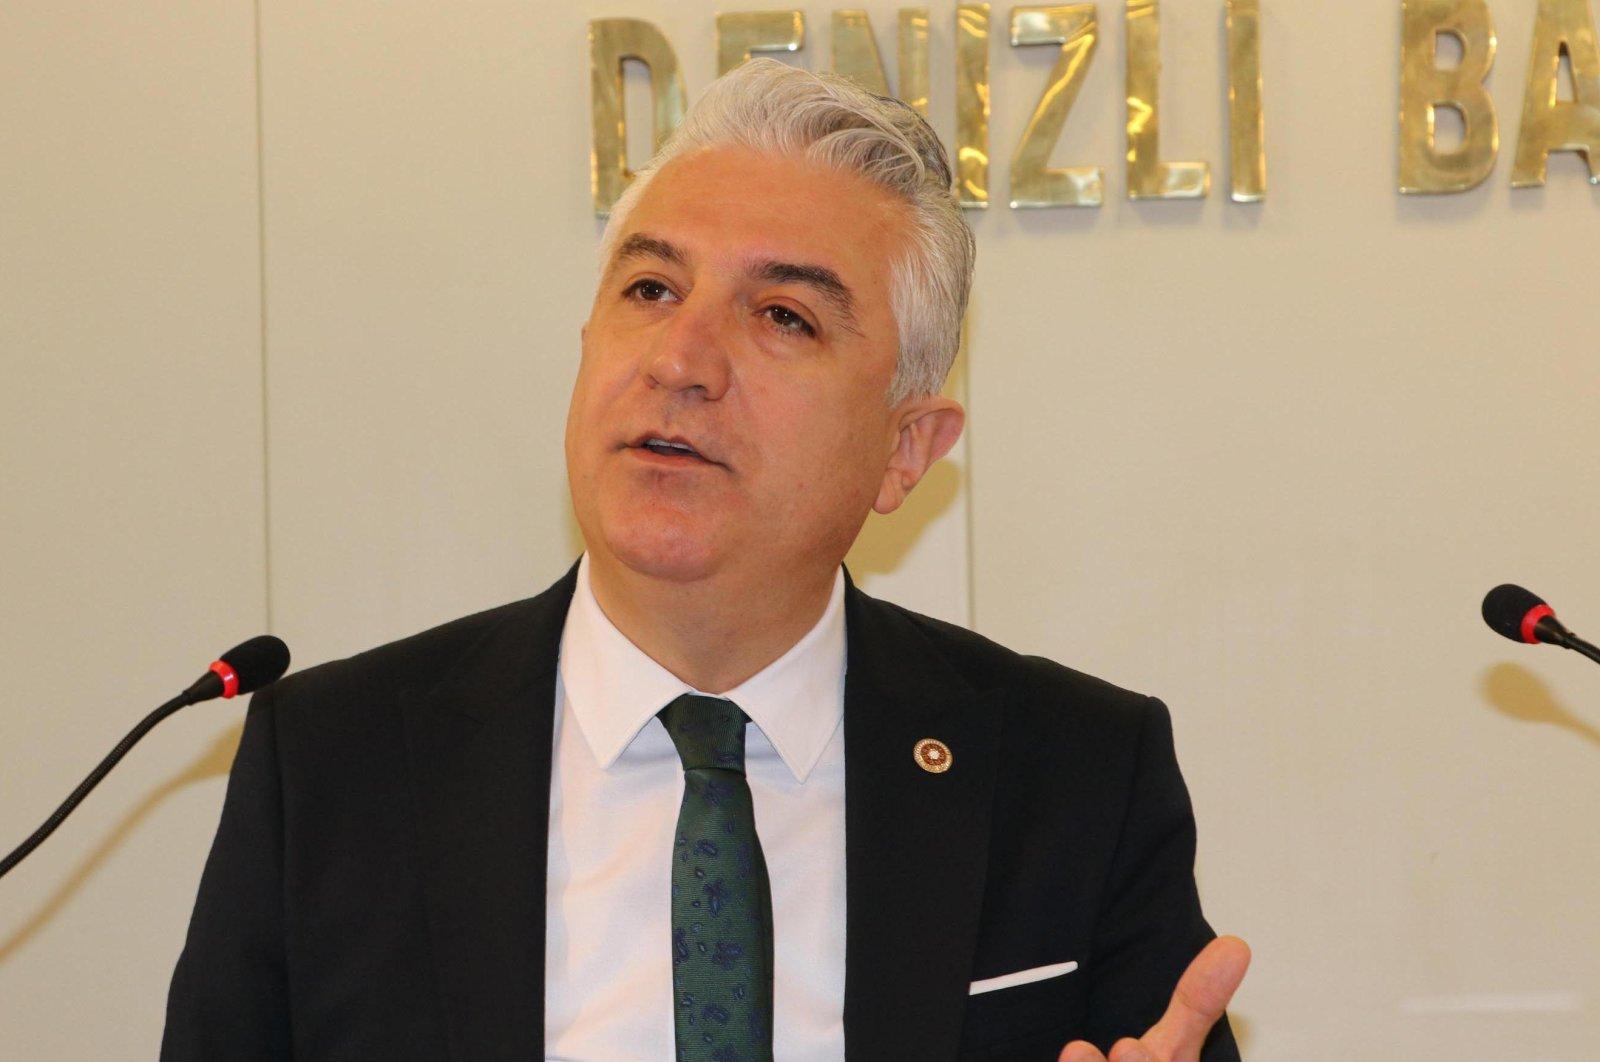 Teoman Sancar speaks at a press conference in Denizli province, western Turkey. (DHA File Photo)